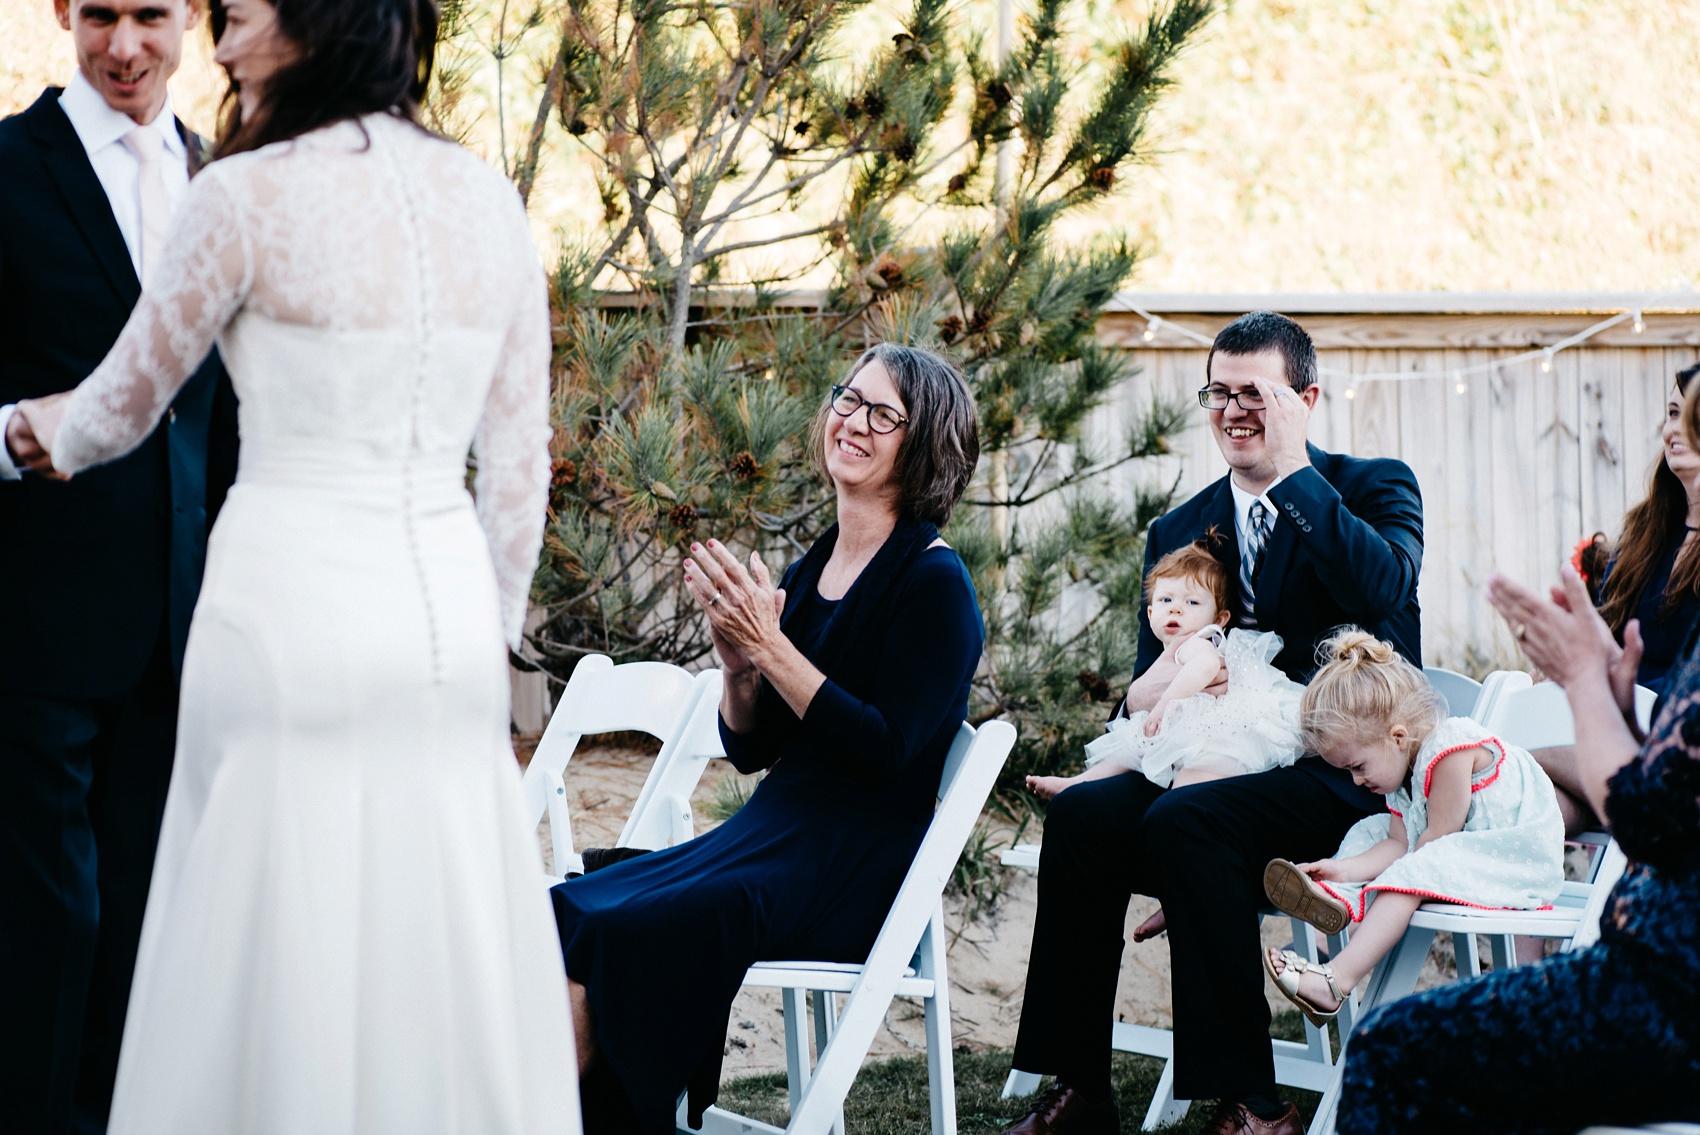 outerbanks_wedding_photographer_1287.jpg